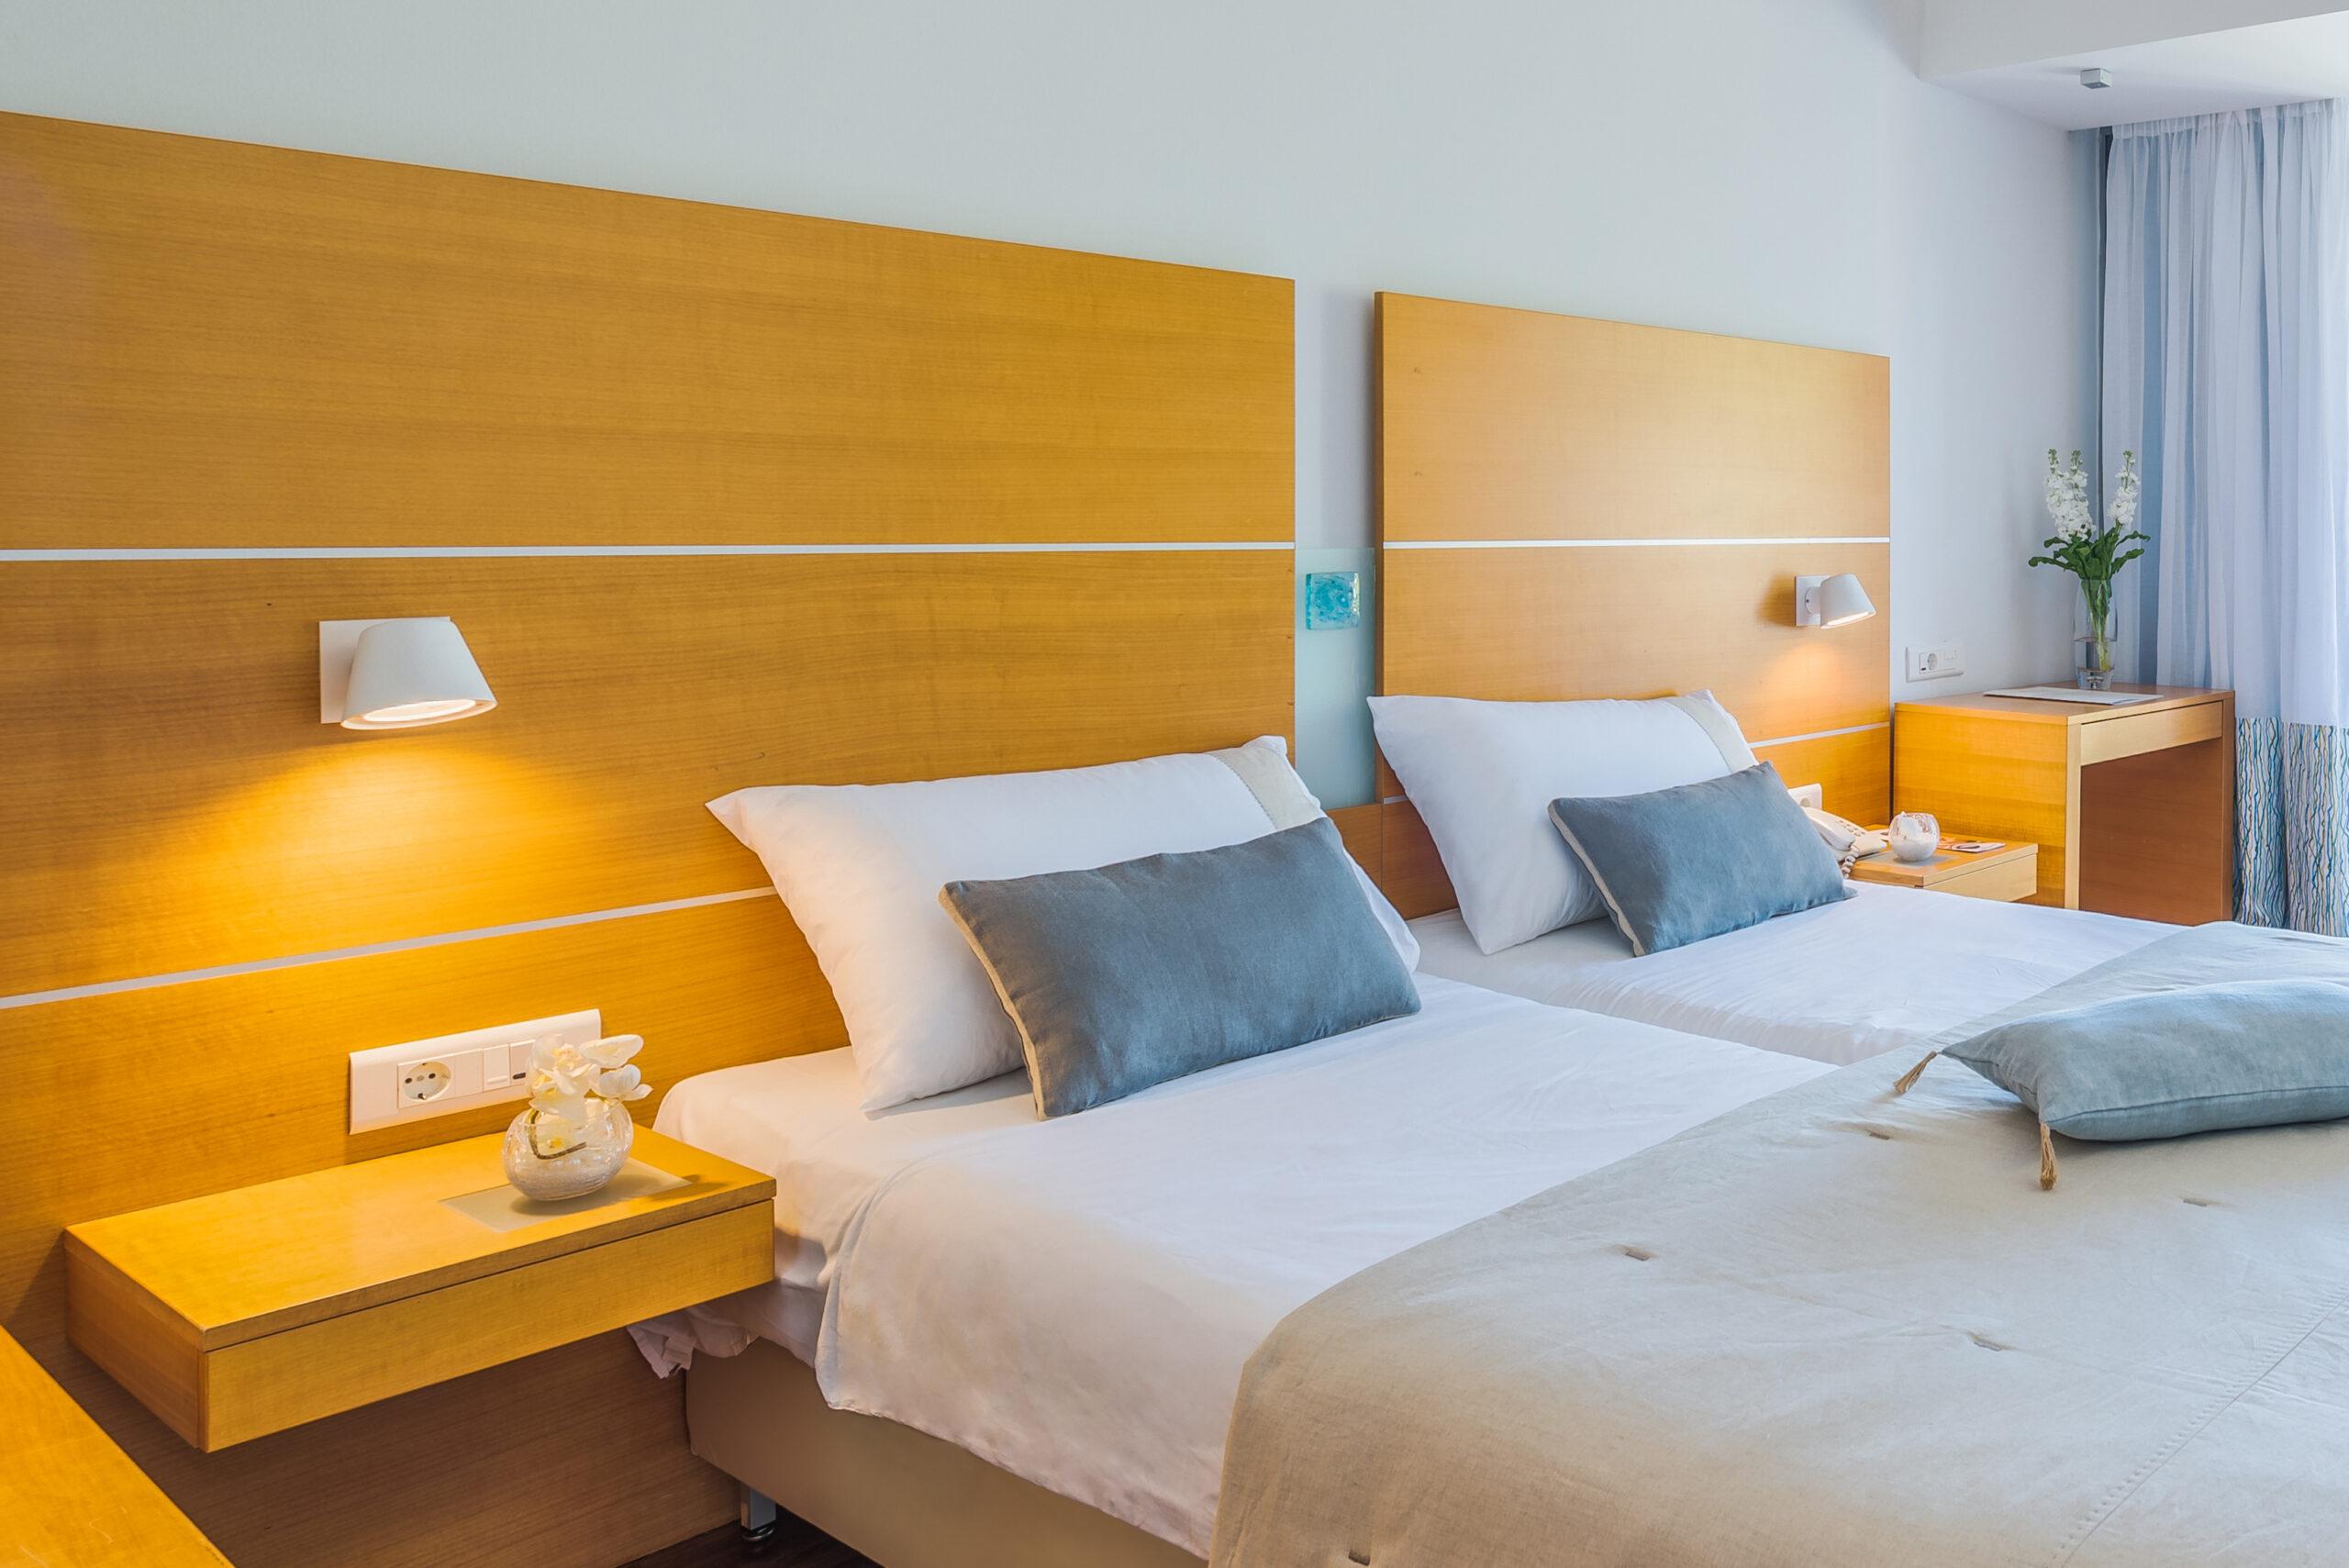 Hotel_Soline - Standard_Double_Room (1)